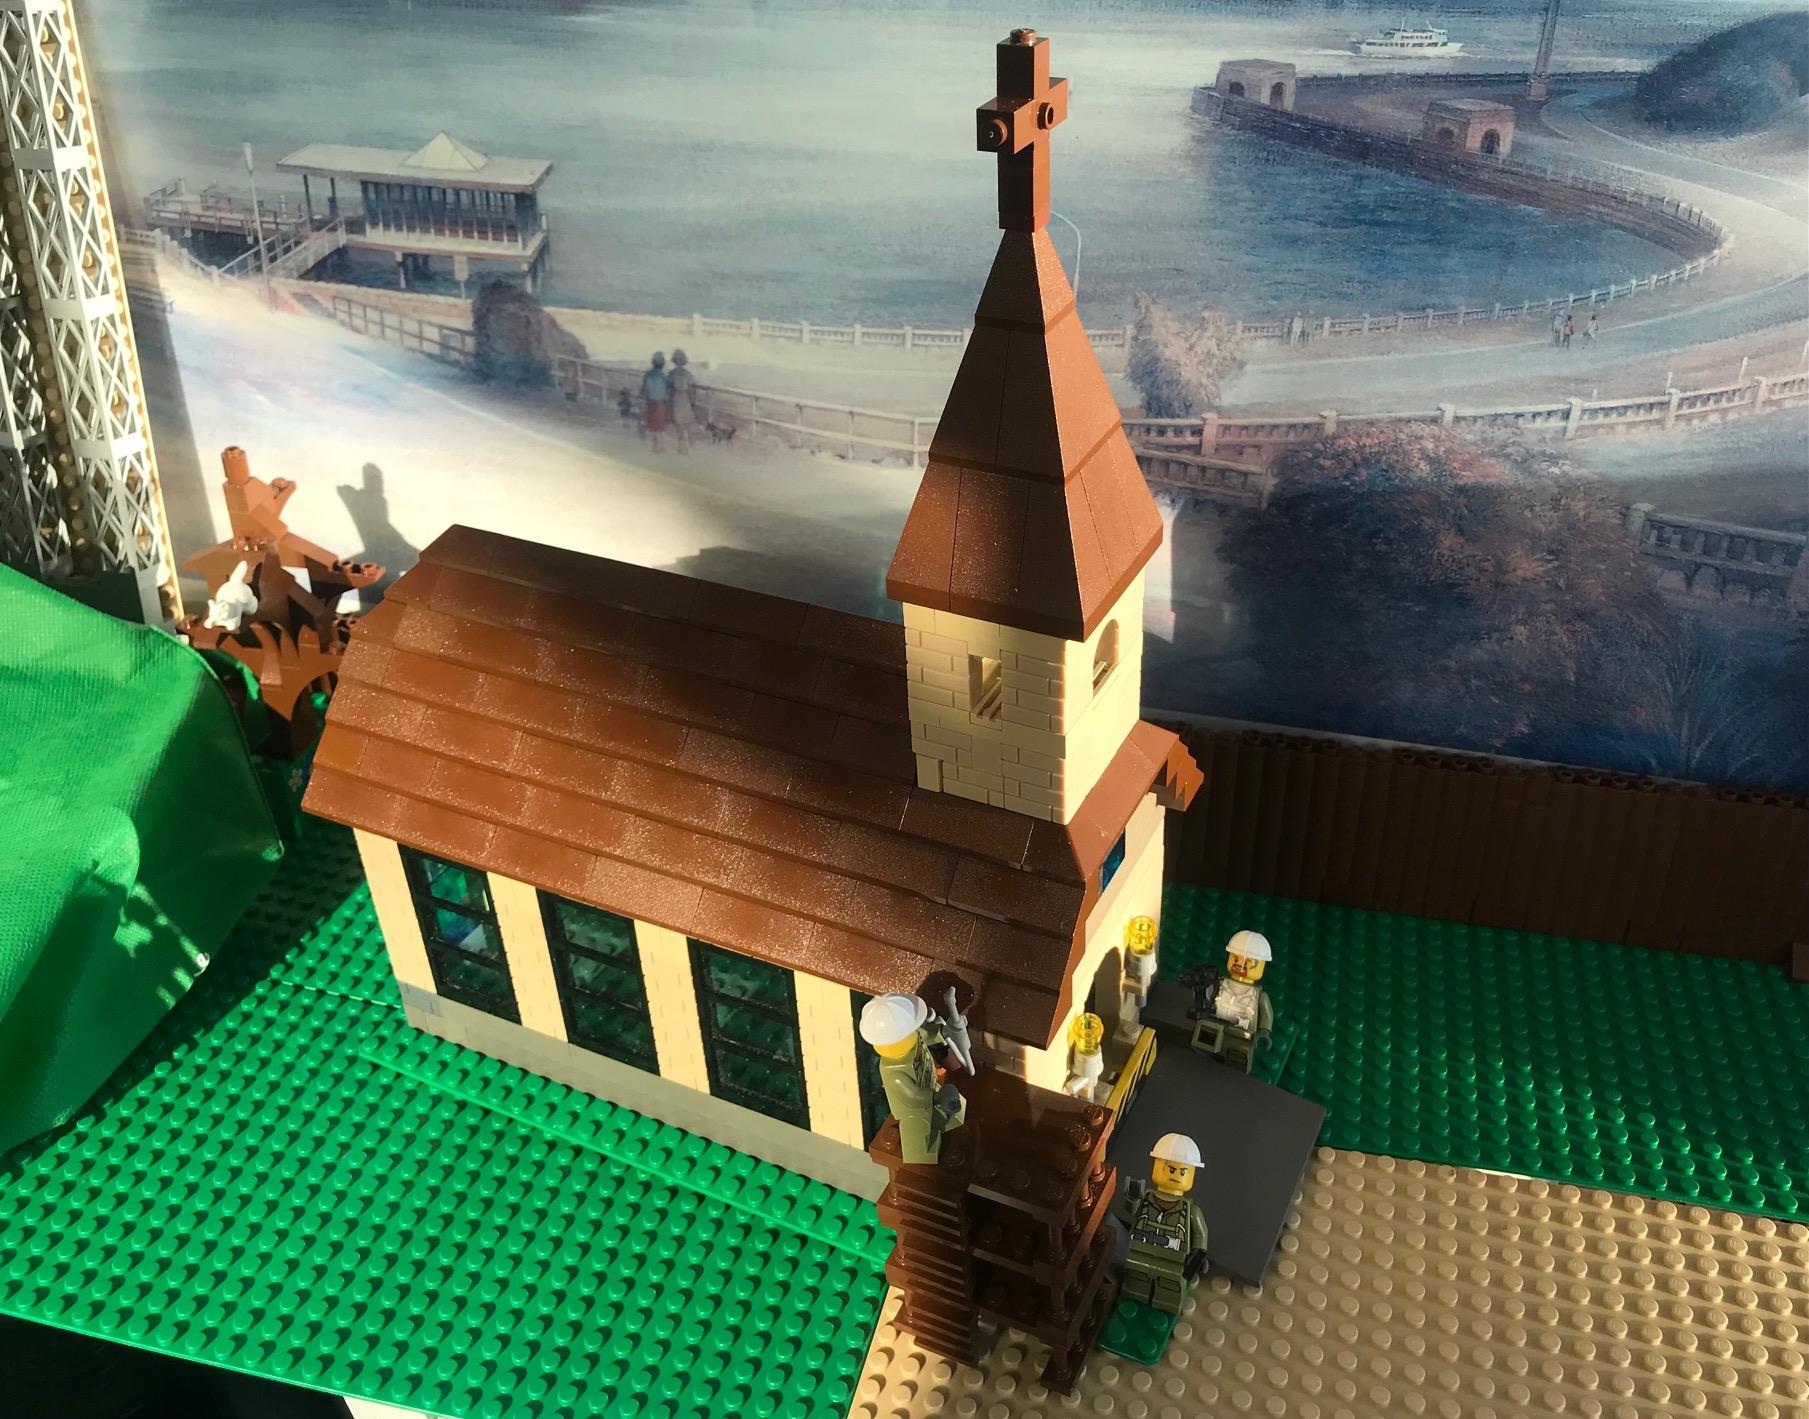 Pastorin Klappert's September Andacht – Weiter Am Haus Gottes Bauen